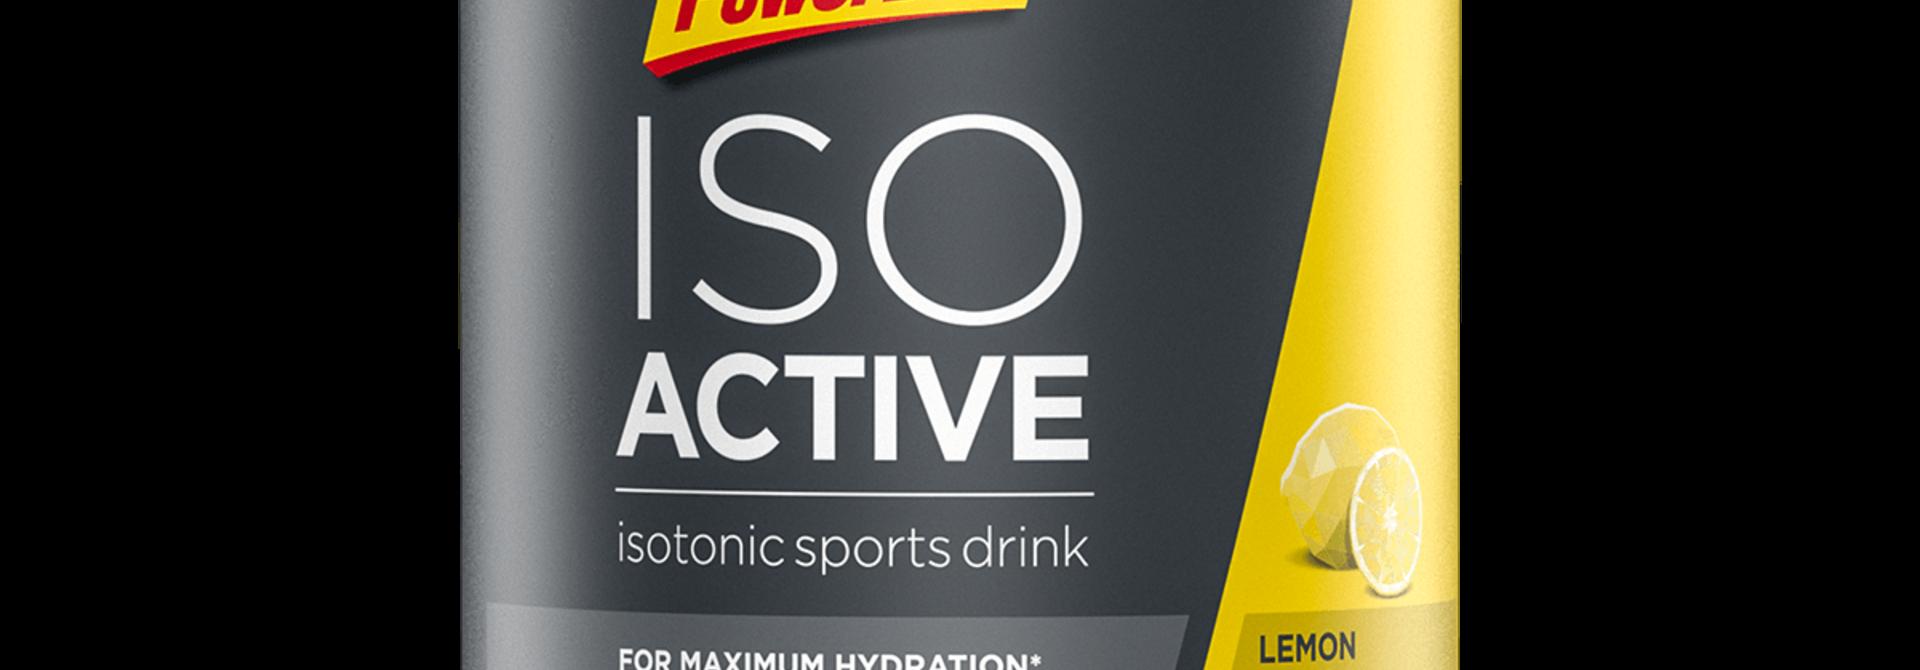 PowerBar Isoactive - Lemon